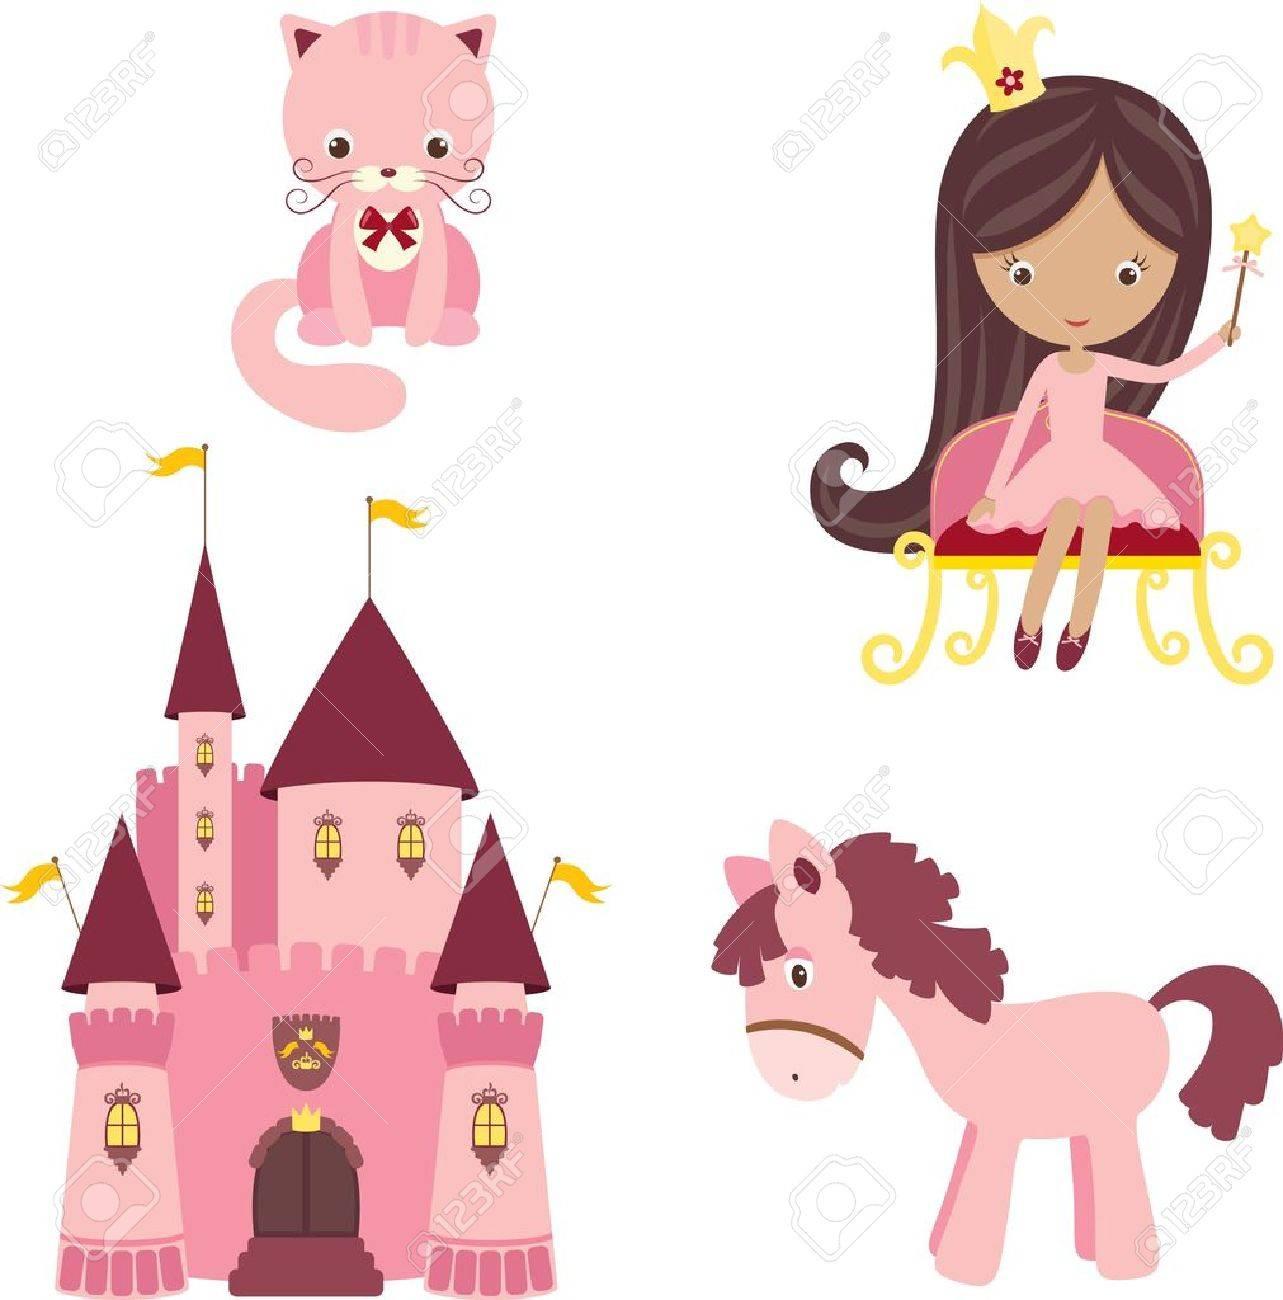 Vector illustration of pink princess design elements Stock Vector - 16136408